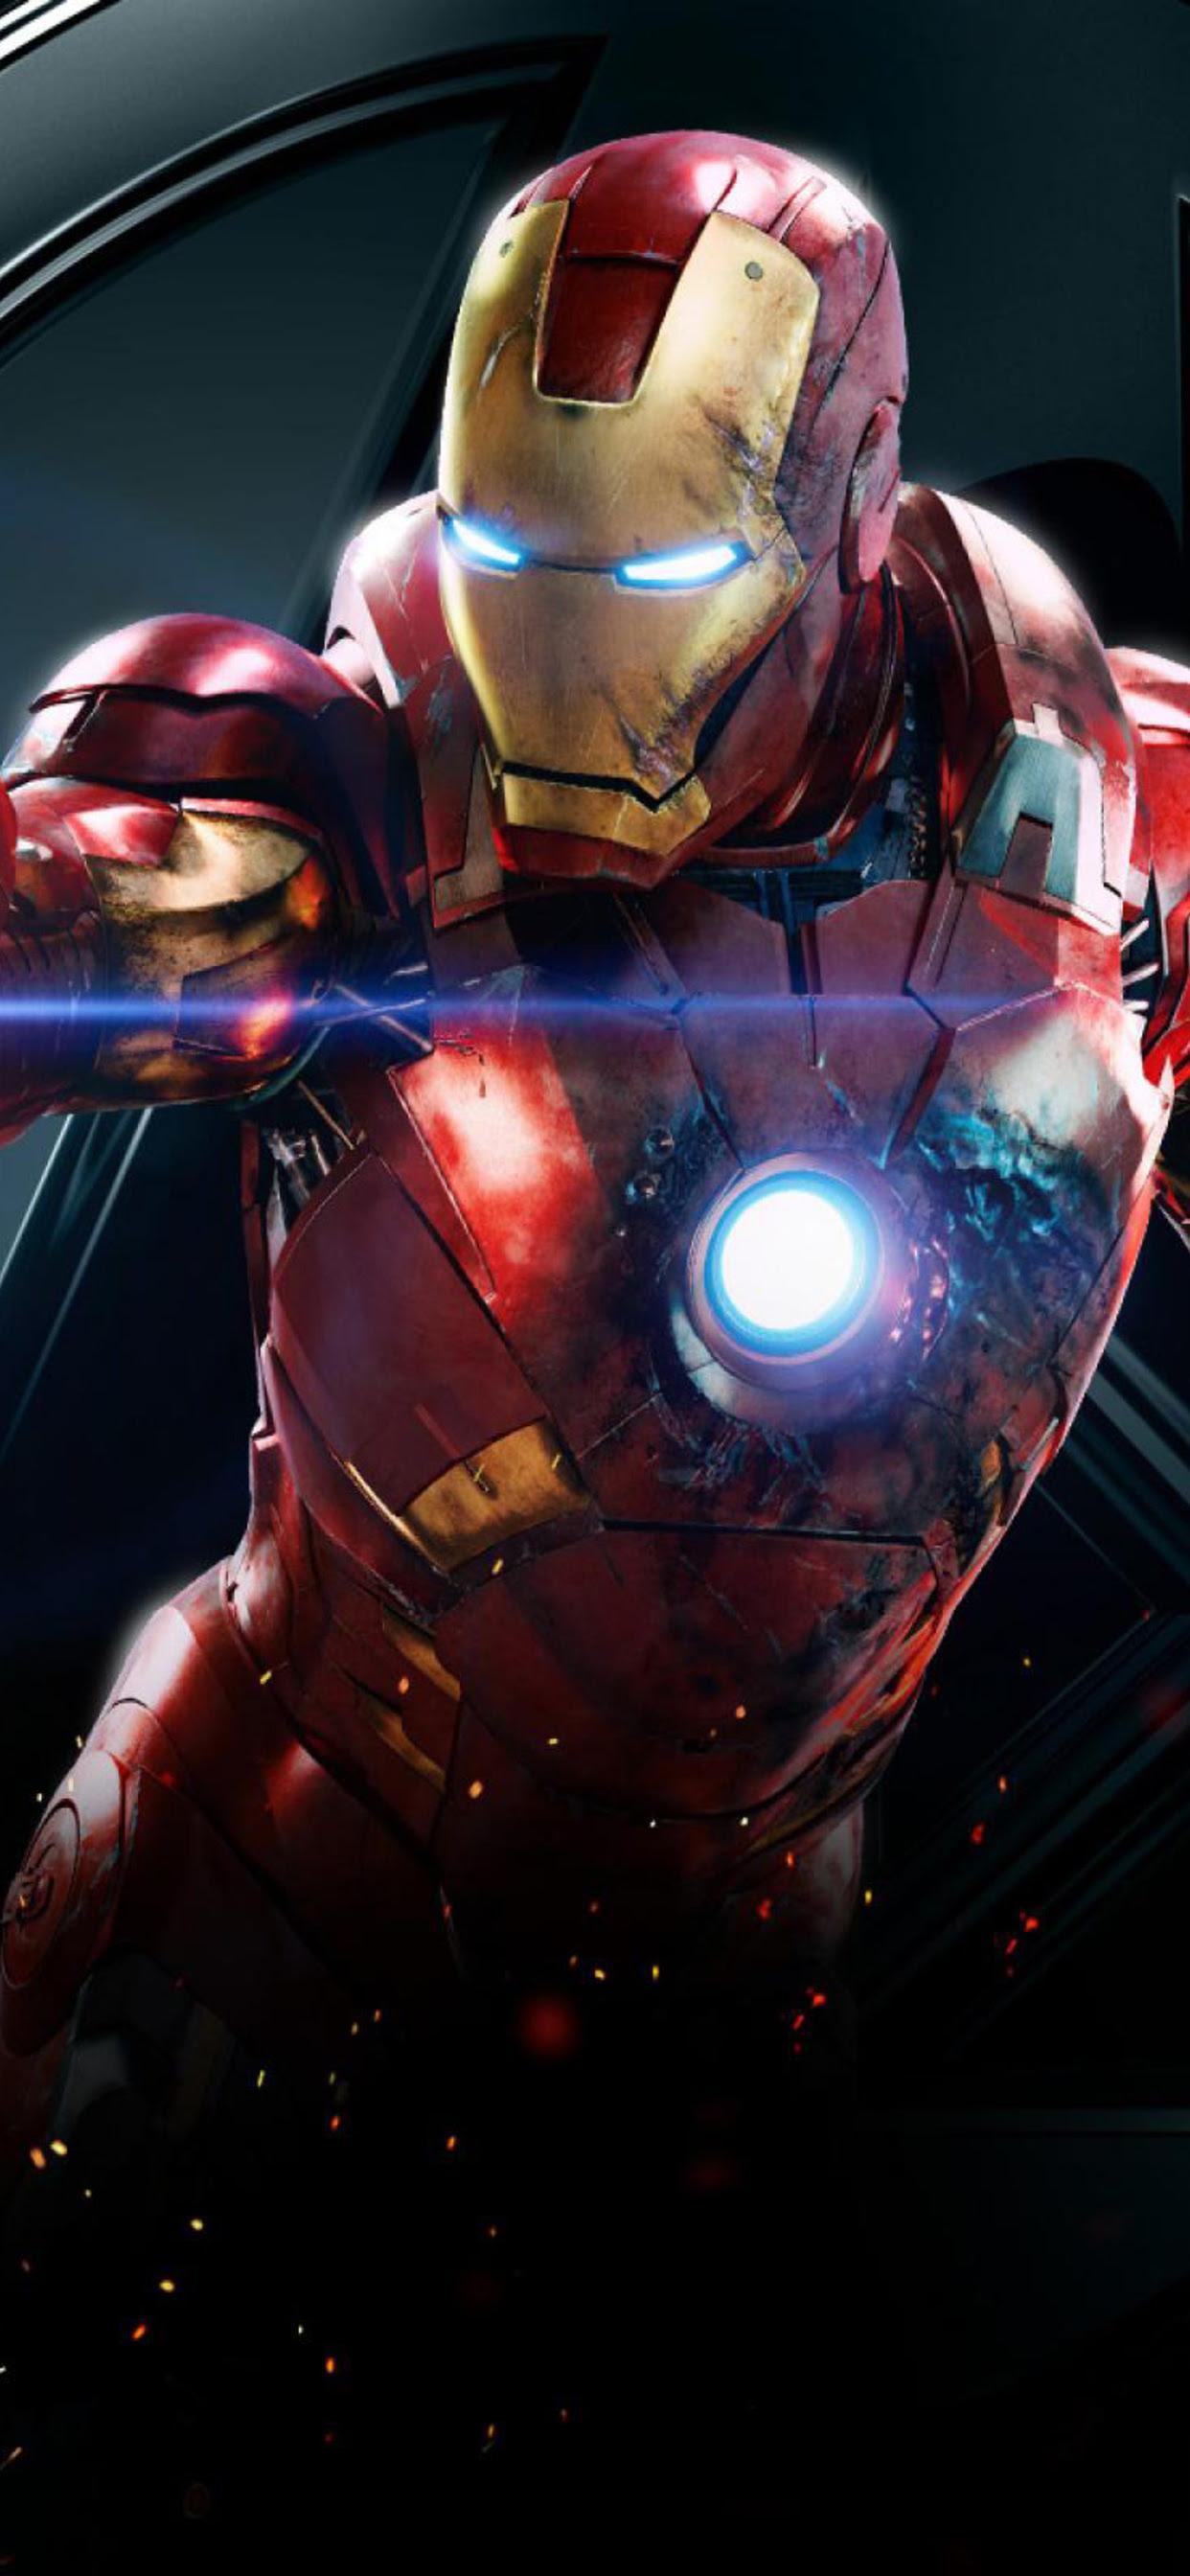 Iron Man Iphone Xs Max Wallpaper Wallpaper Iphone